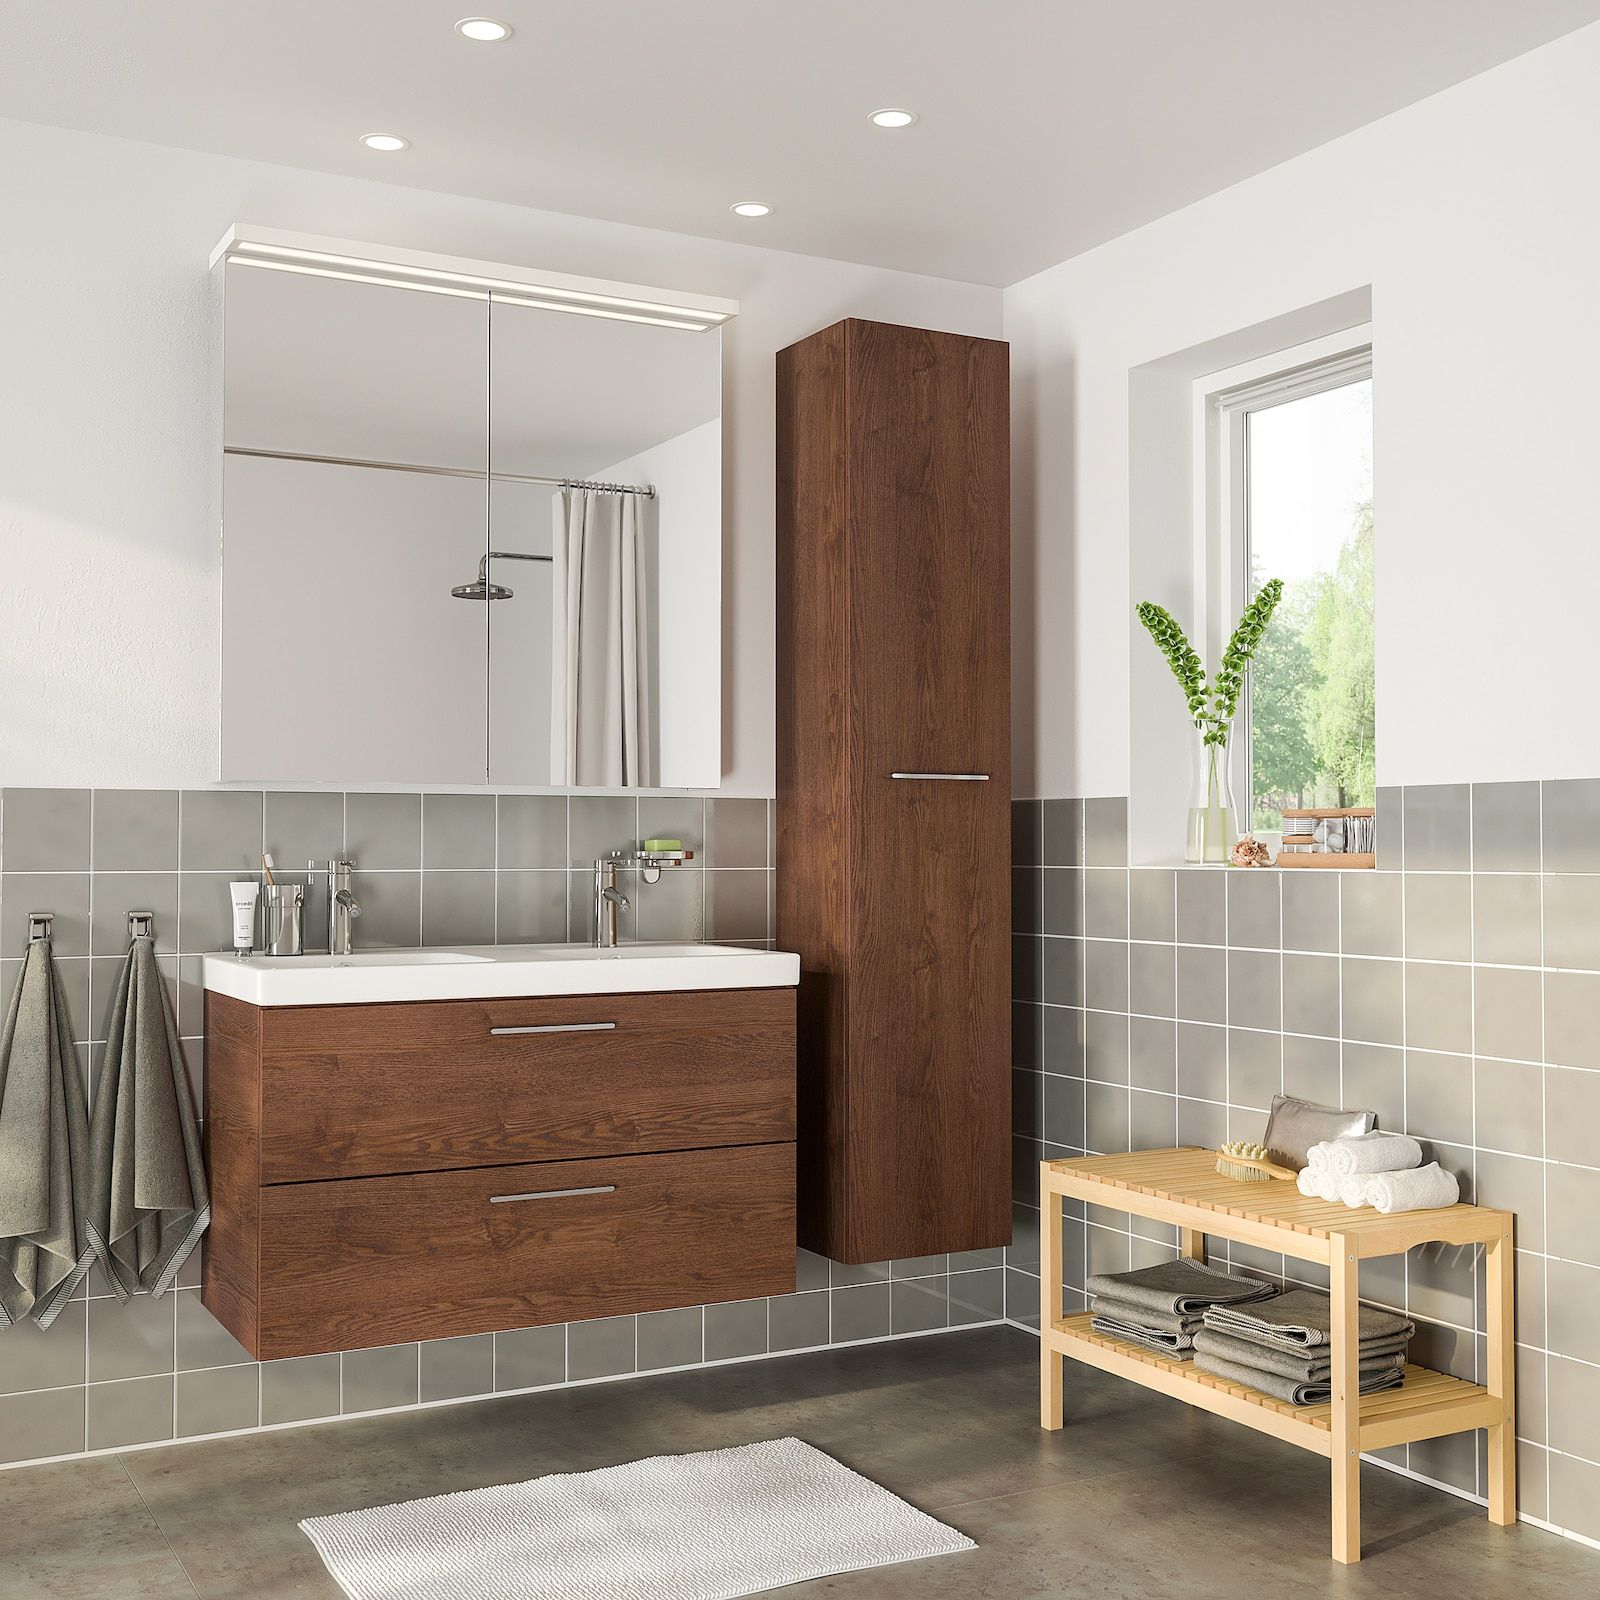 GODMORGON / ODENSVIK Bathroom furniture, set of 10, brown stained